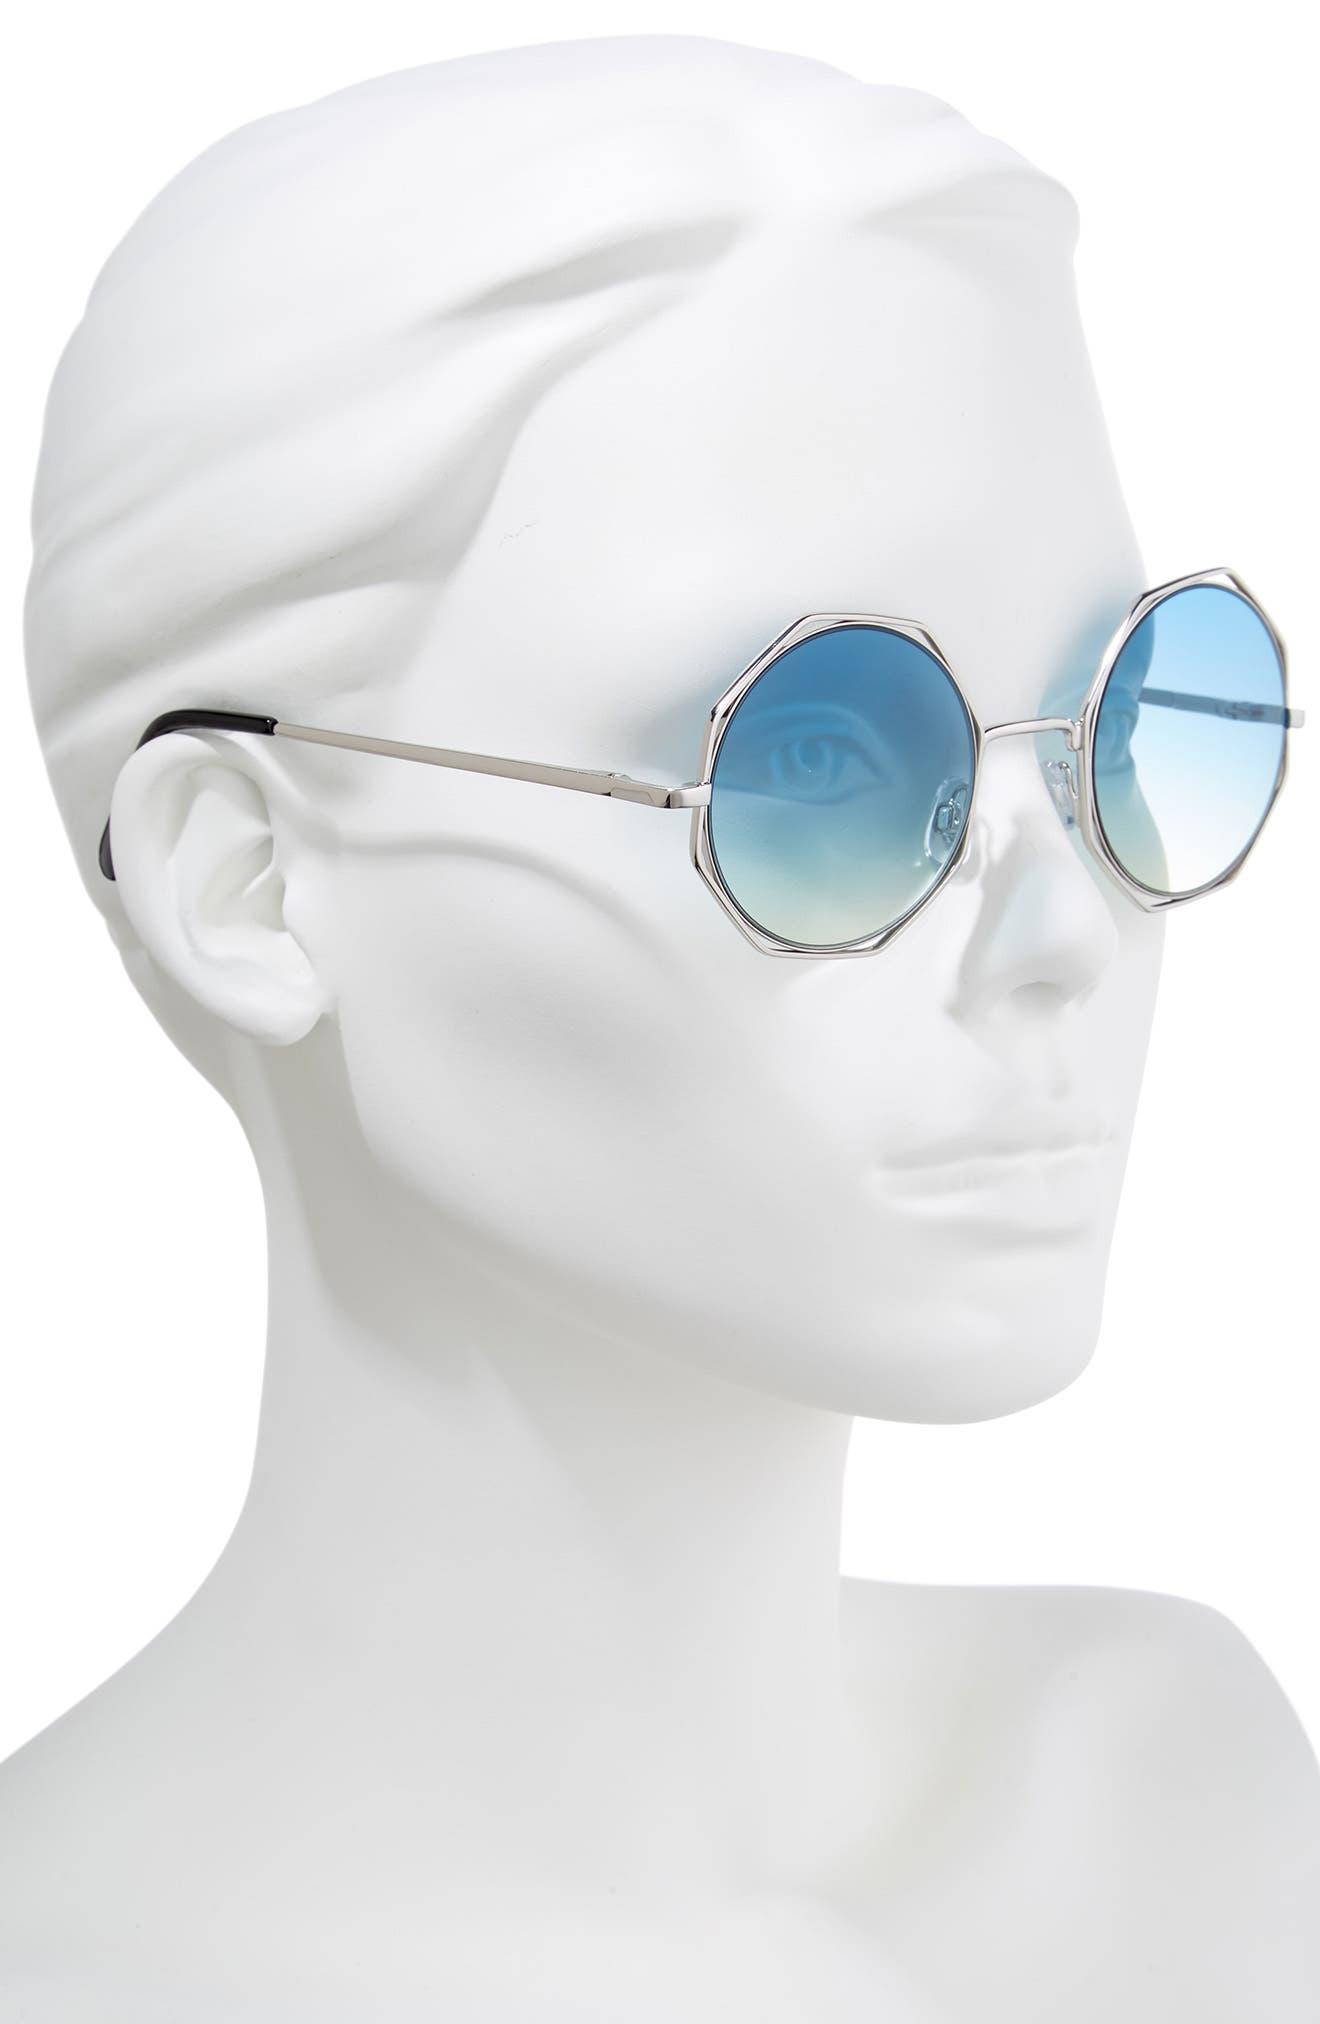 50mm Round Sunglasses,                             Alternate thumbnail 2, color,                             040